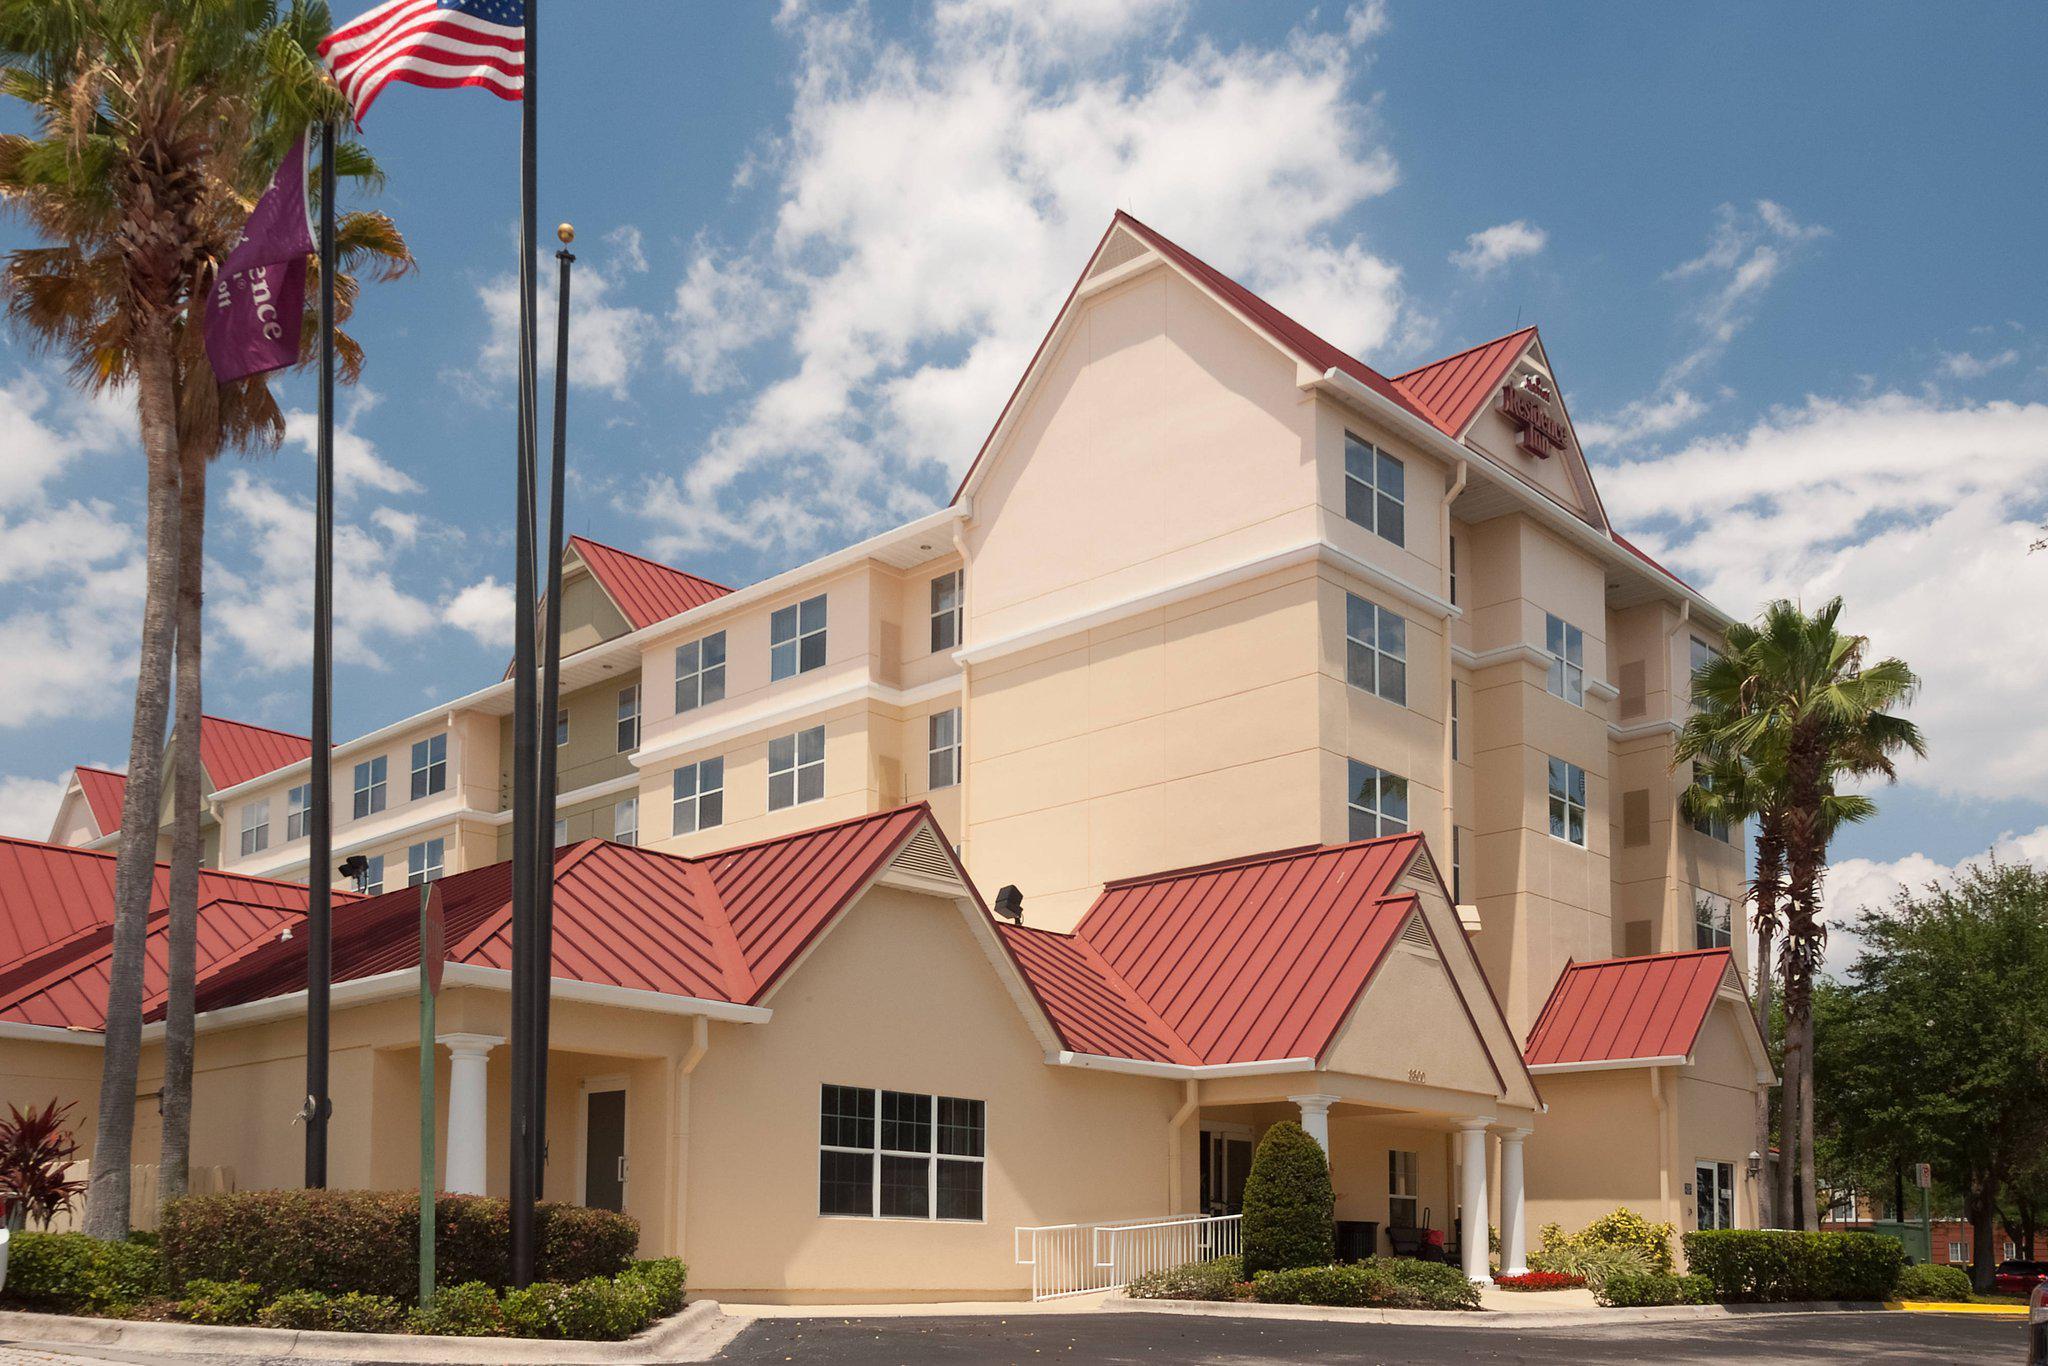 Residence Inn by Marriott Orlando Convention Center